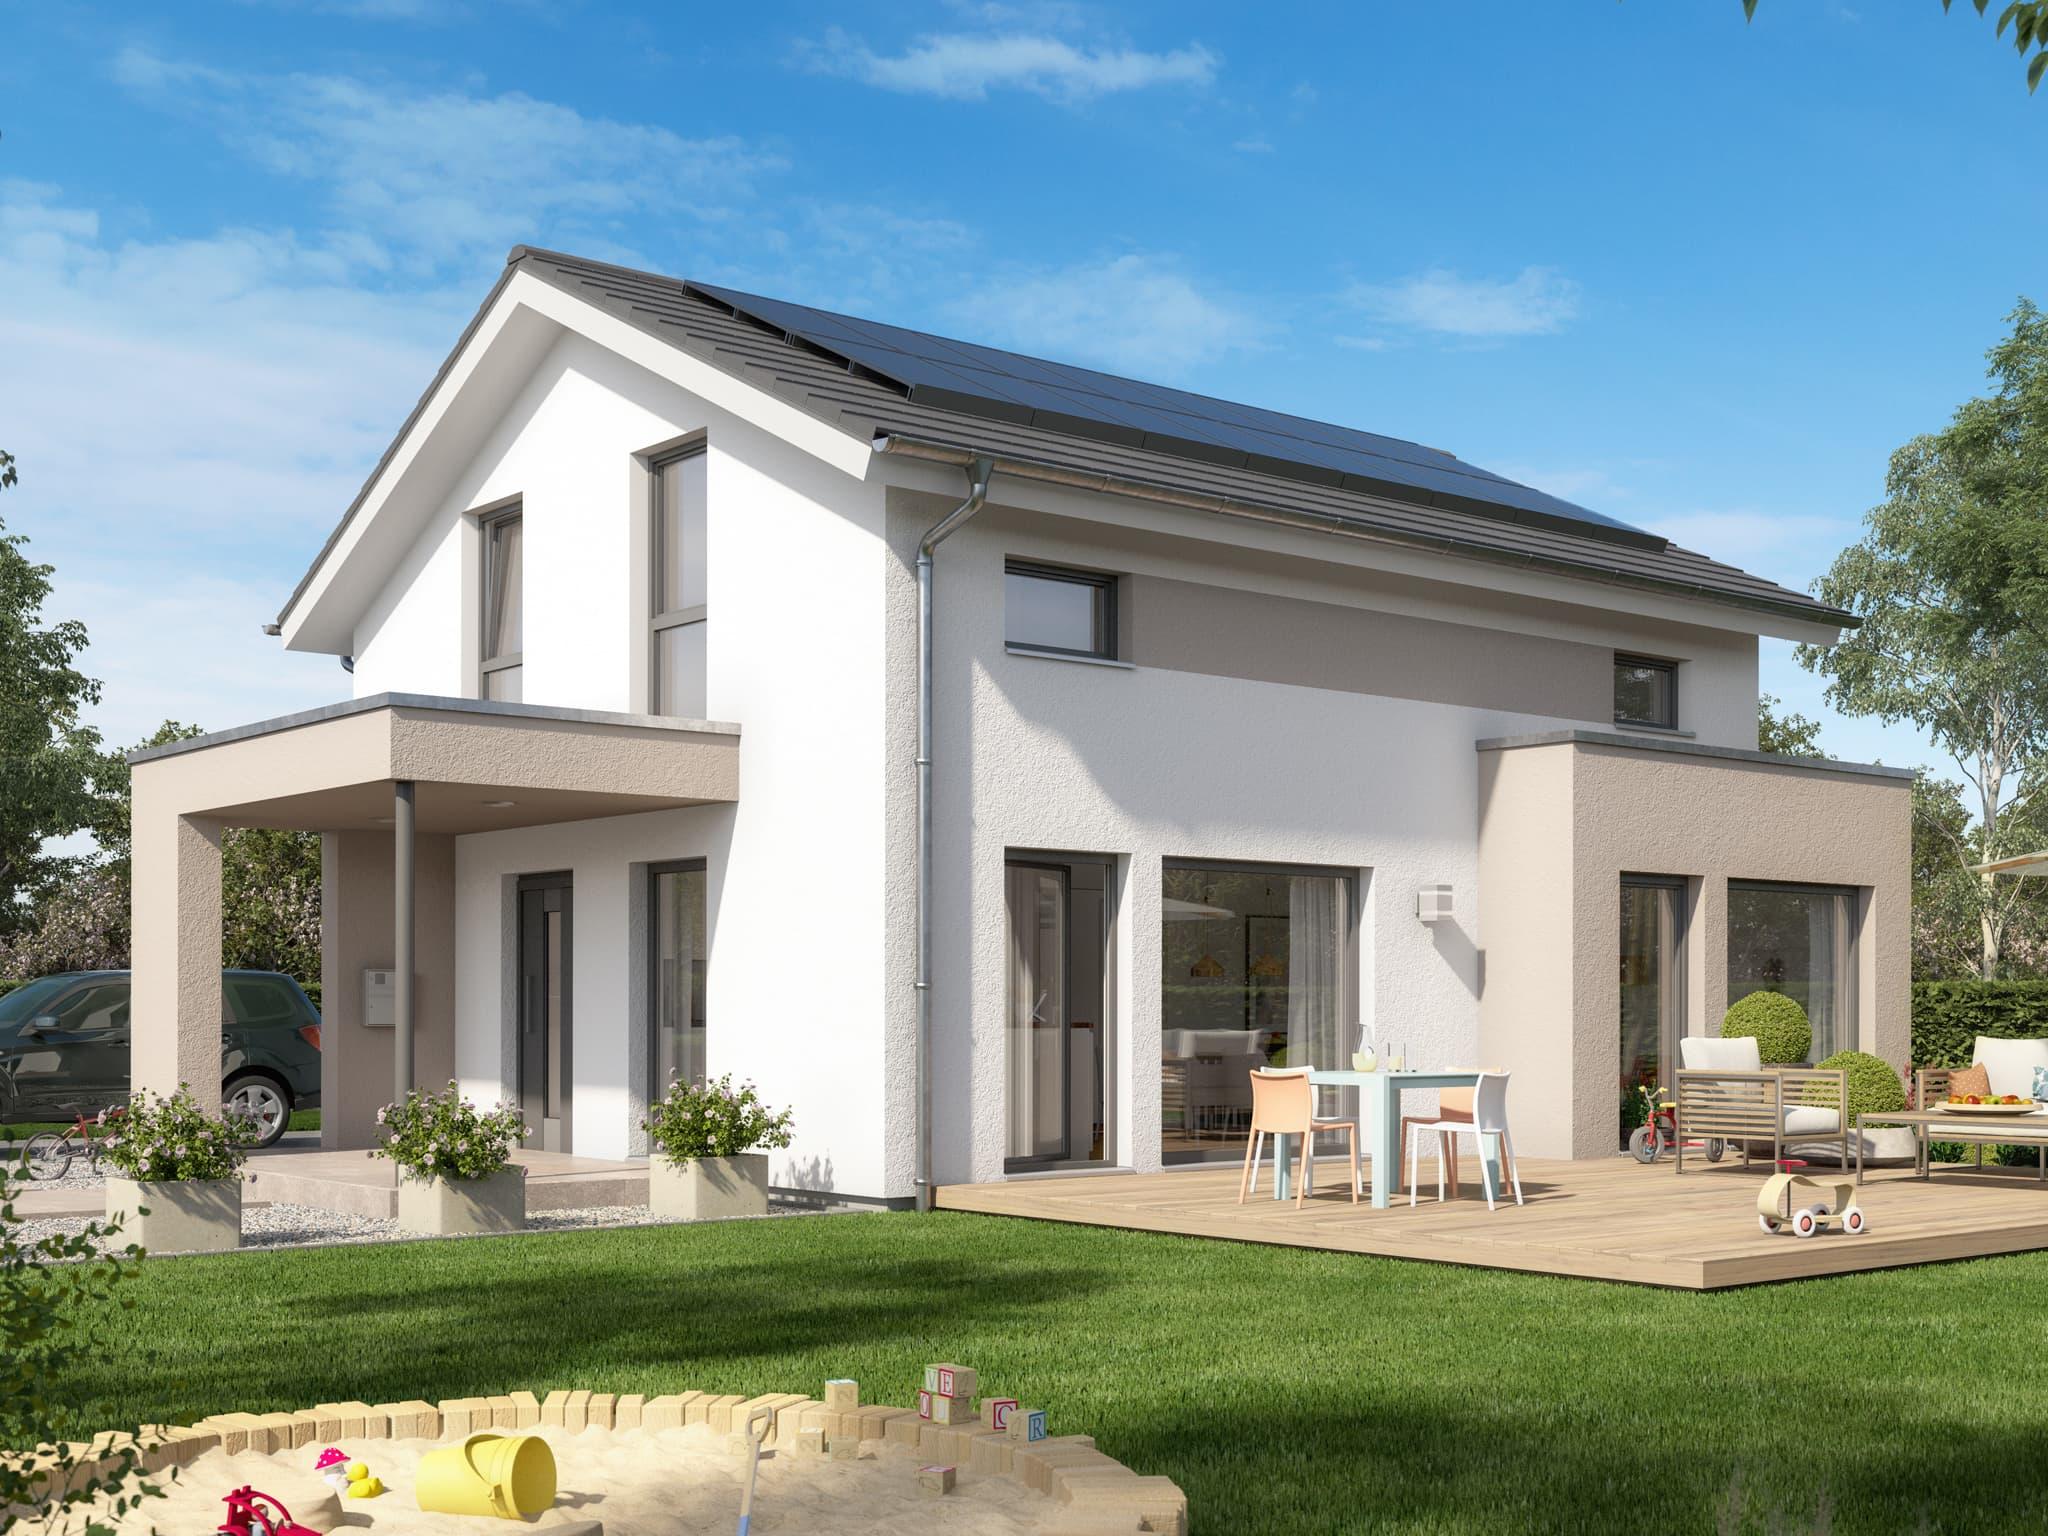 Einfamilienhaus modern mit Satteldach & Erker - Fertighaus Living Haus SUNSHINE 125 V5 - HausbauDirekt.de